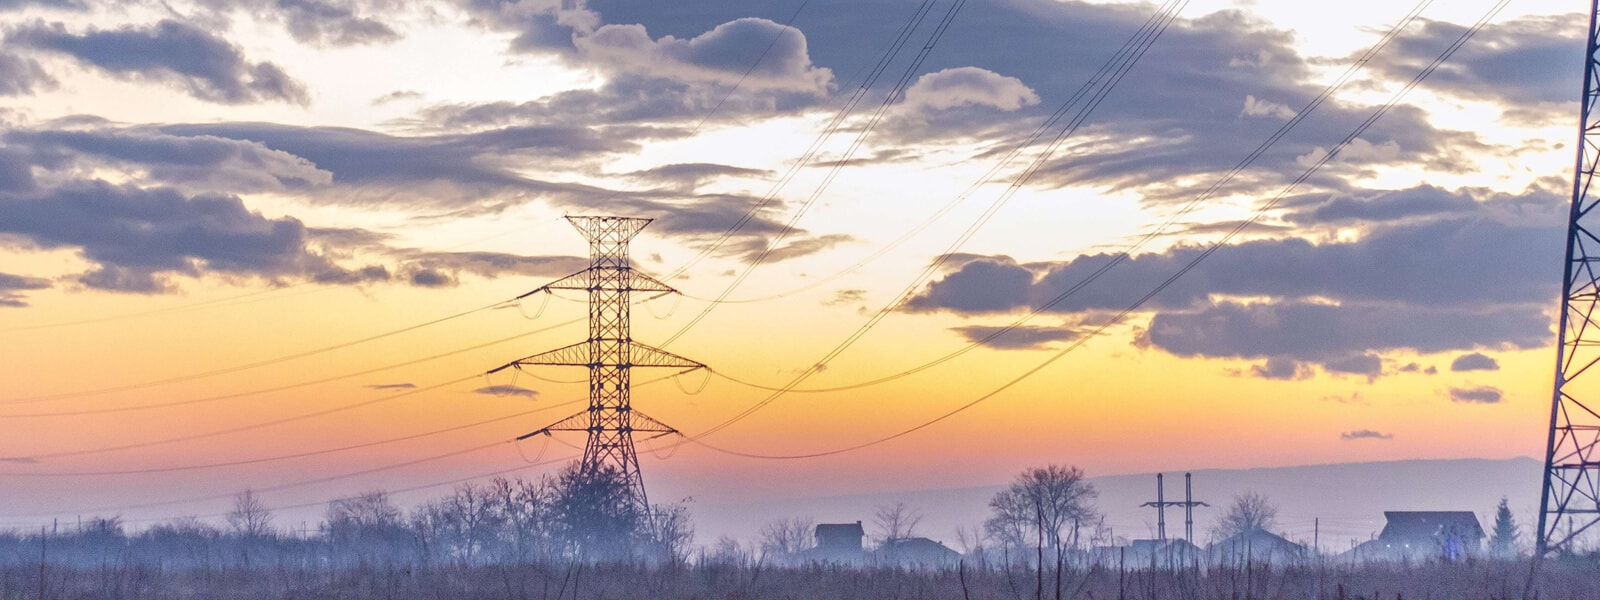 savingsmart-save-money-business-energy-communications-costs